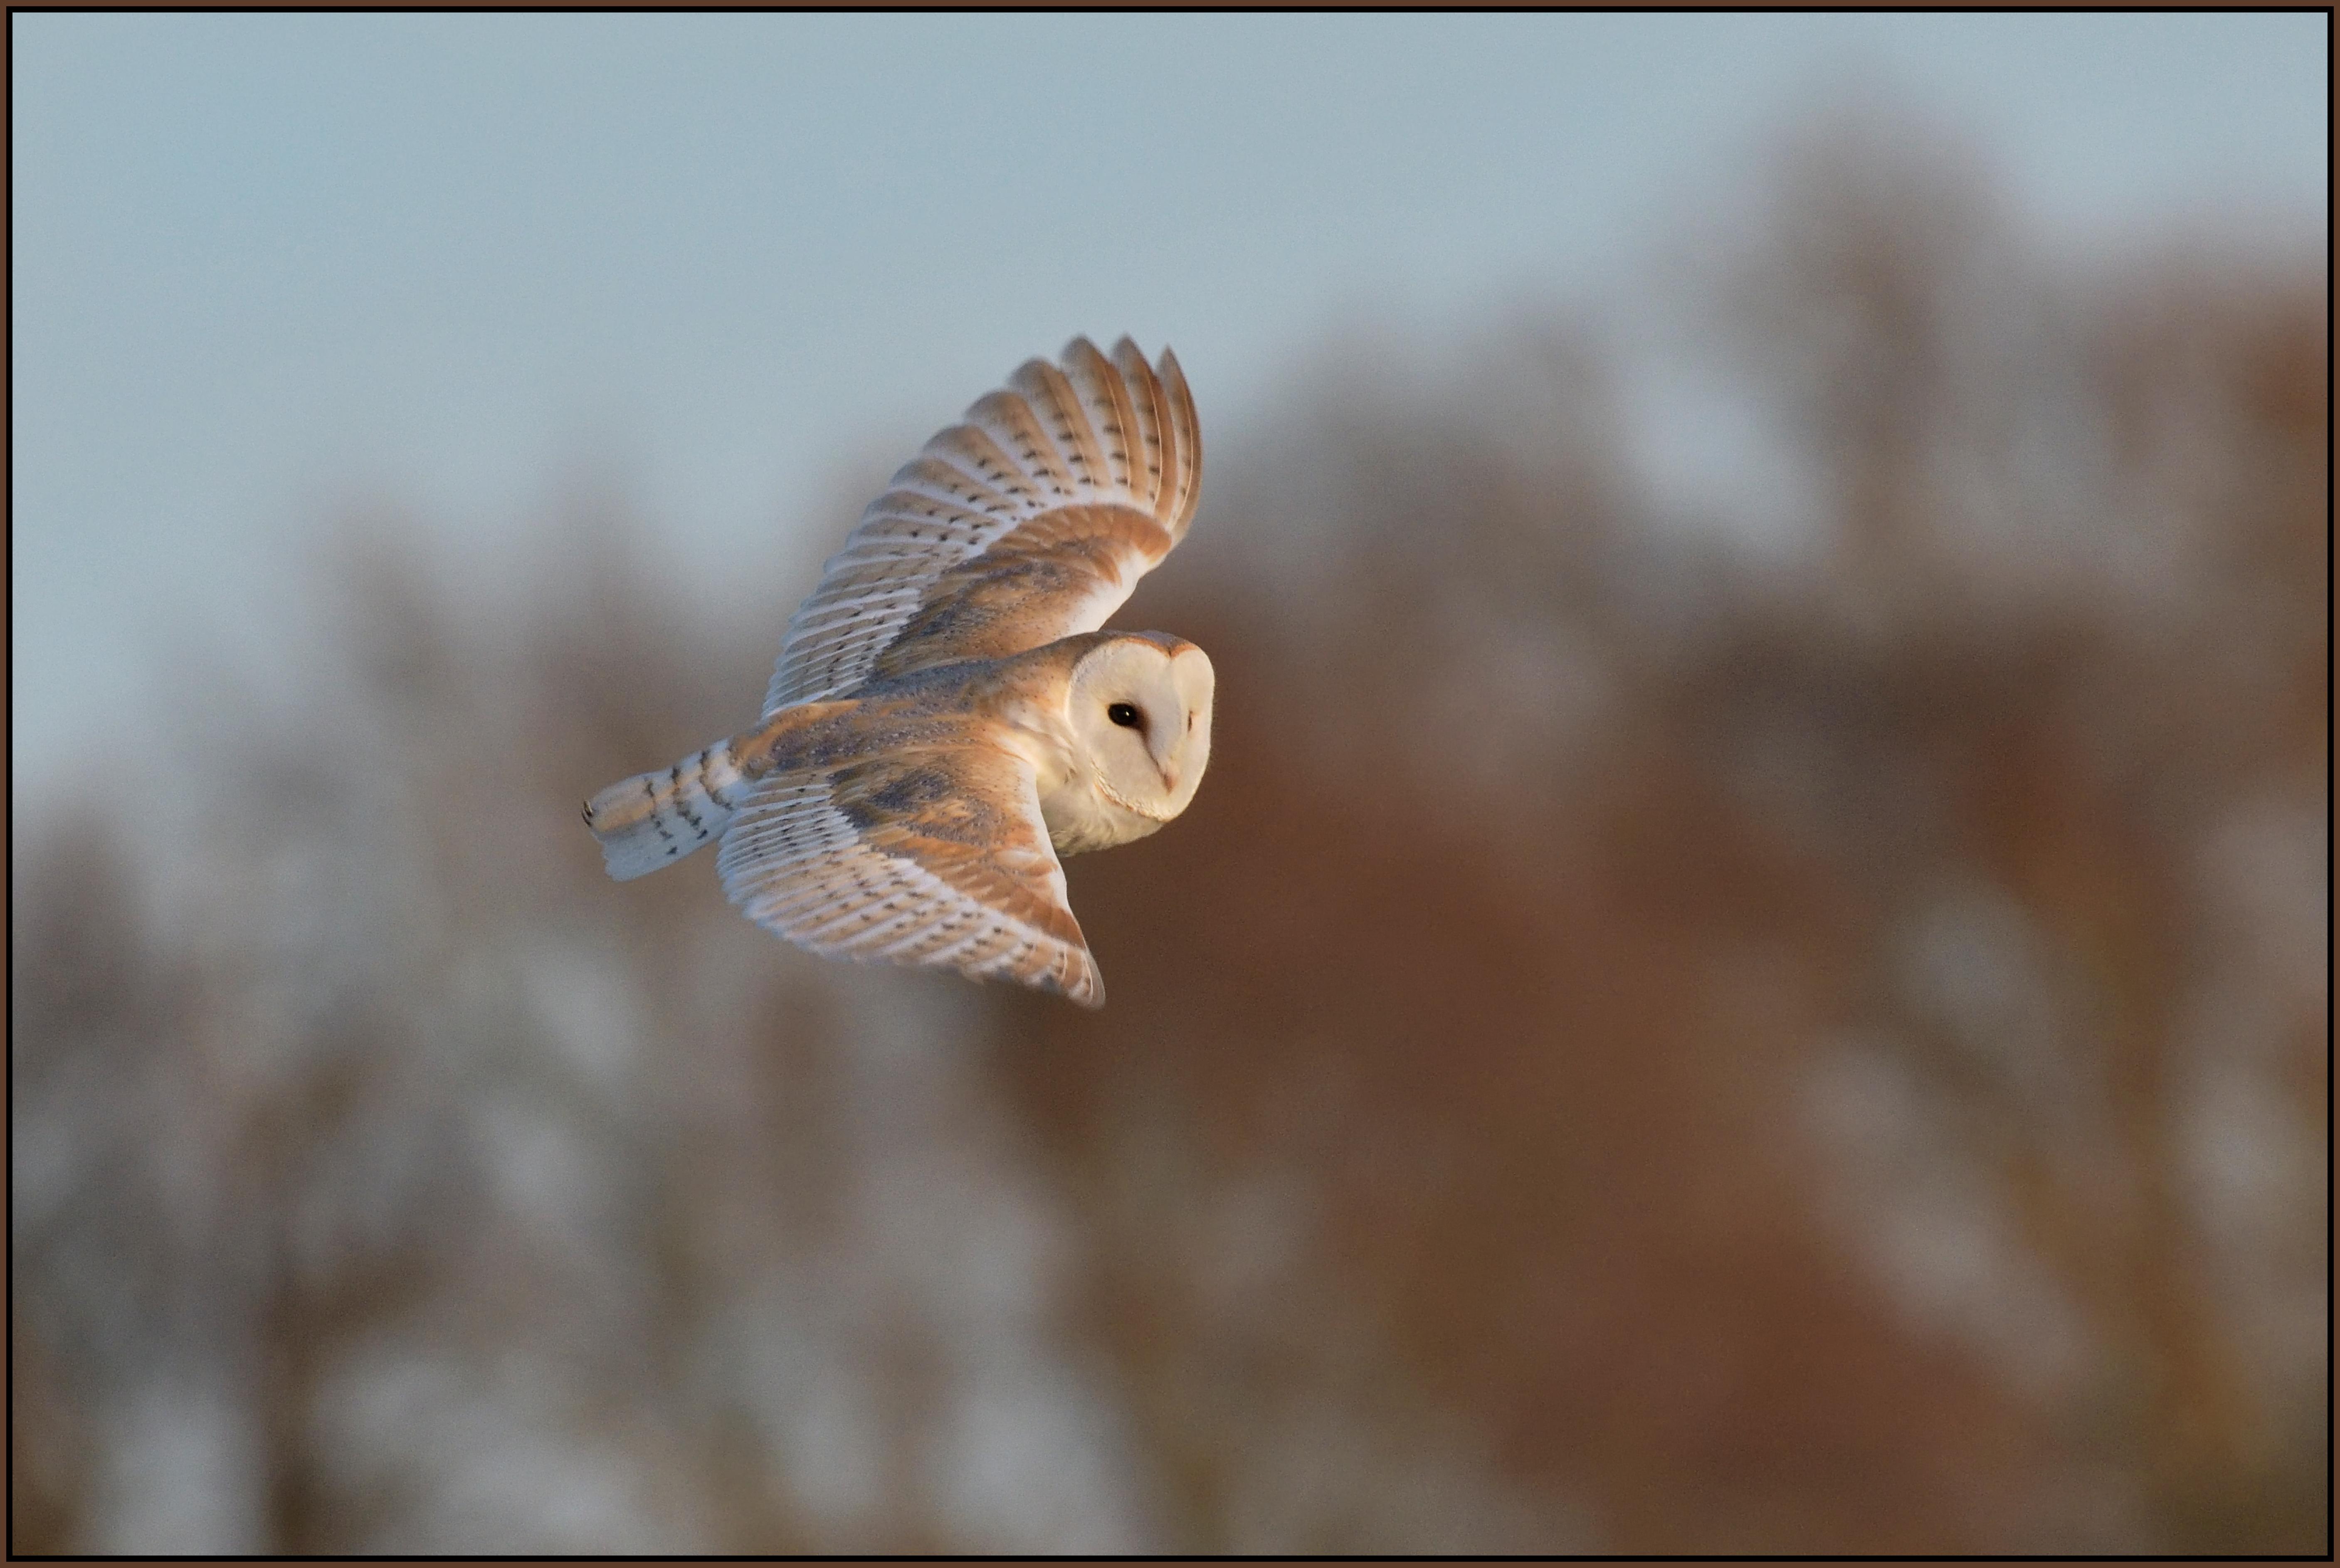 Wallpaper : nature, flying, wildlife, bird of prey, barn ...